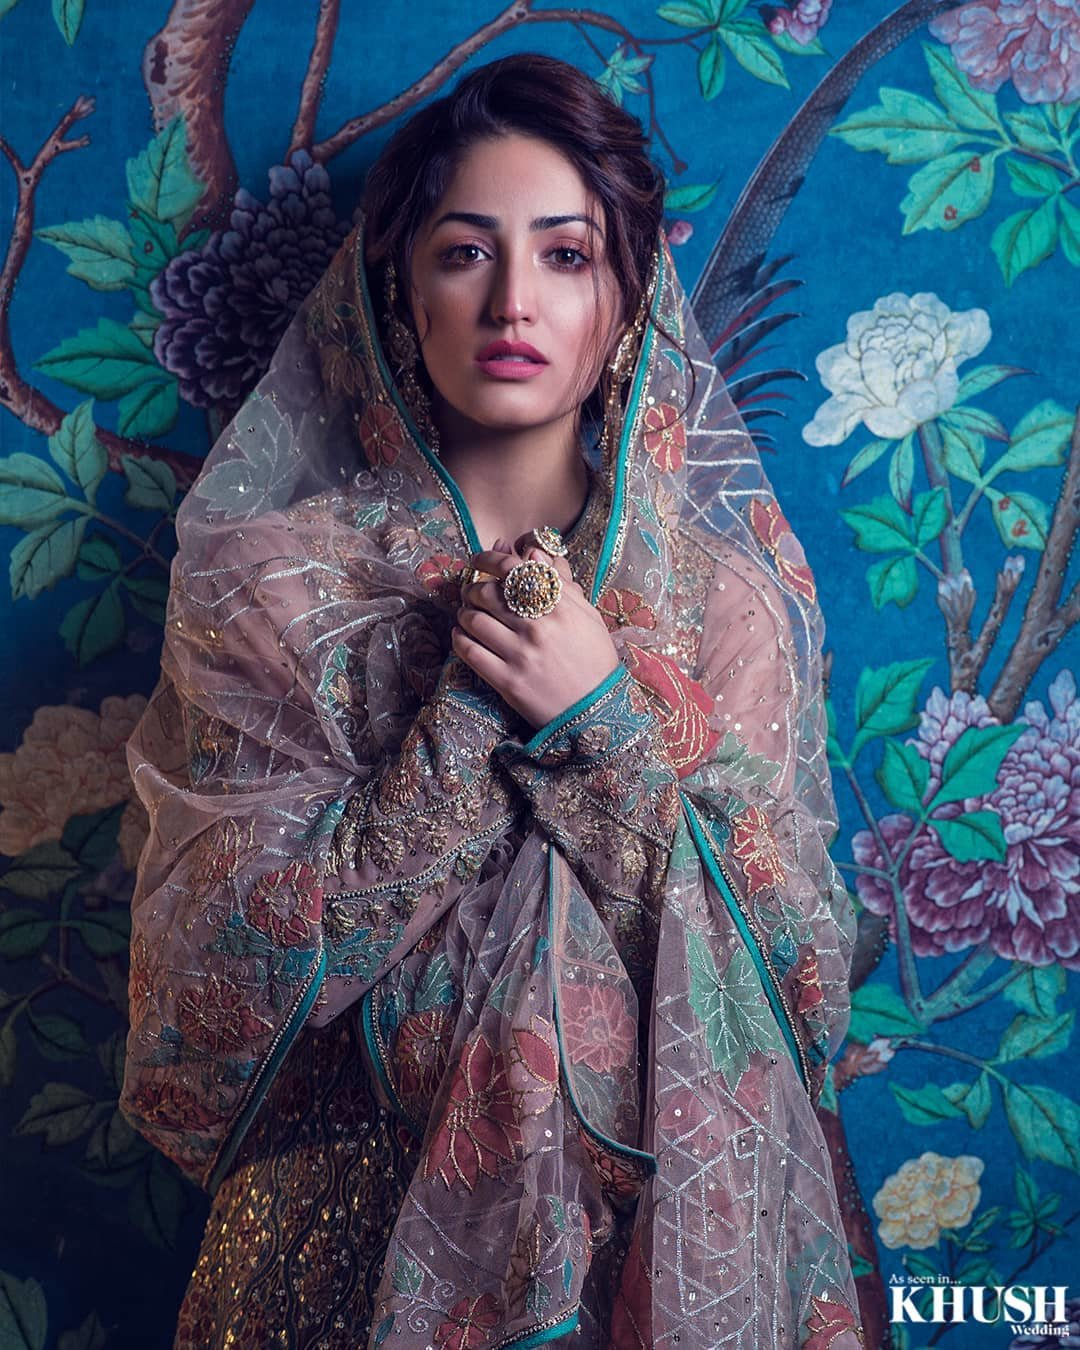 Yami Gautam For Khush Magazine Photoshoot